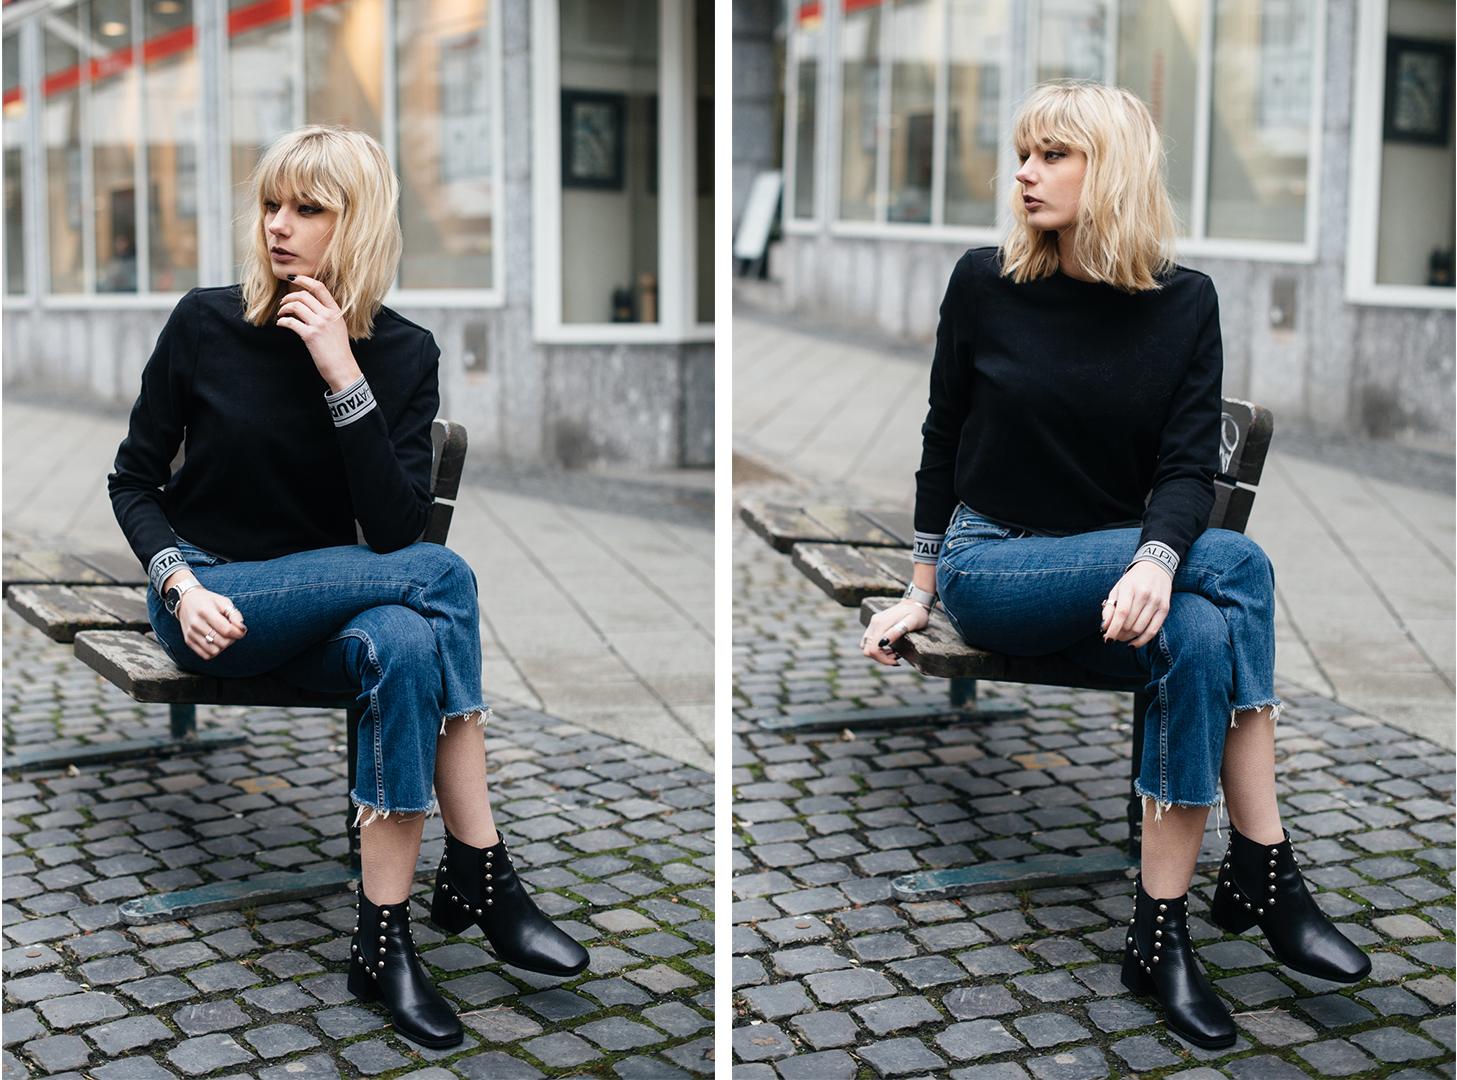 Kiamisu_Zign_Cropped Jeans ausgfranst_Mango_Schuhe_Leo Schal_Outfit_Inspiration_Fashionblog_Modeblog_Kiamisu-collage-1